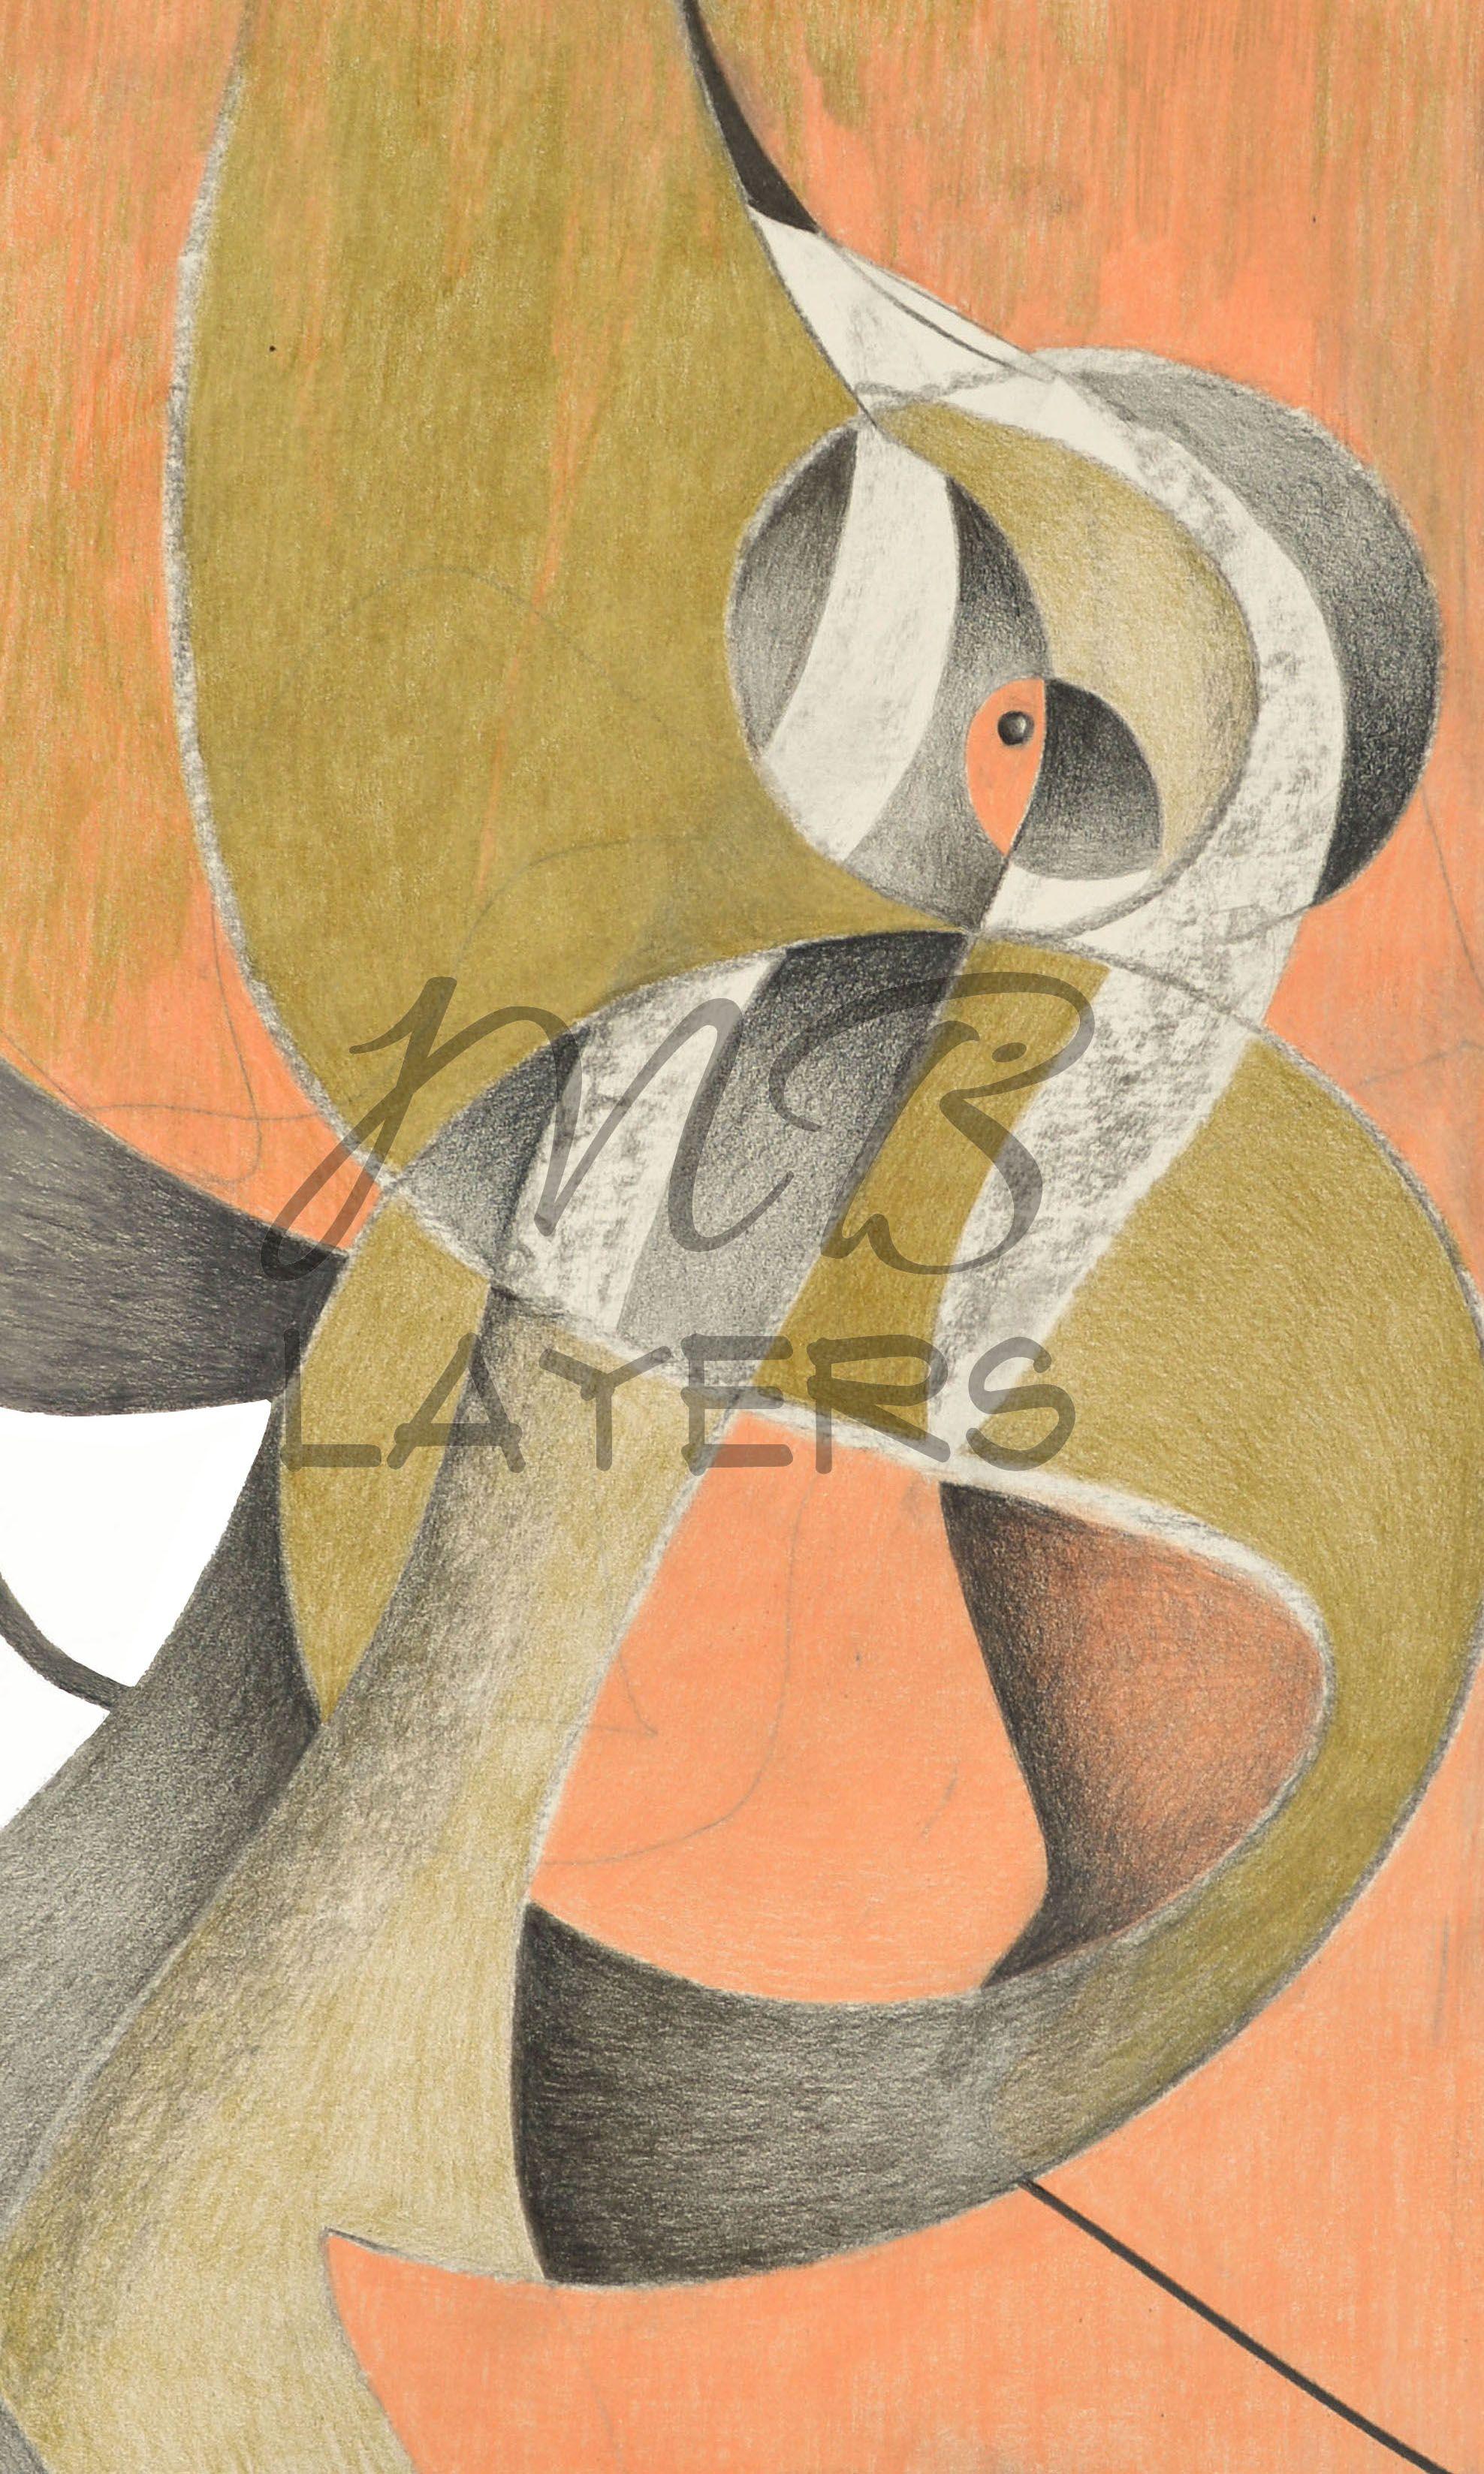 Wall art print, original artwork, bird drawing, print illustration ...